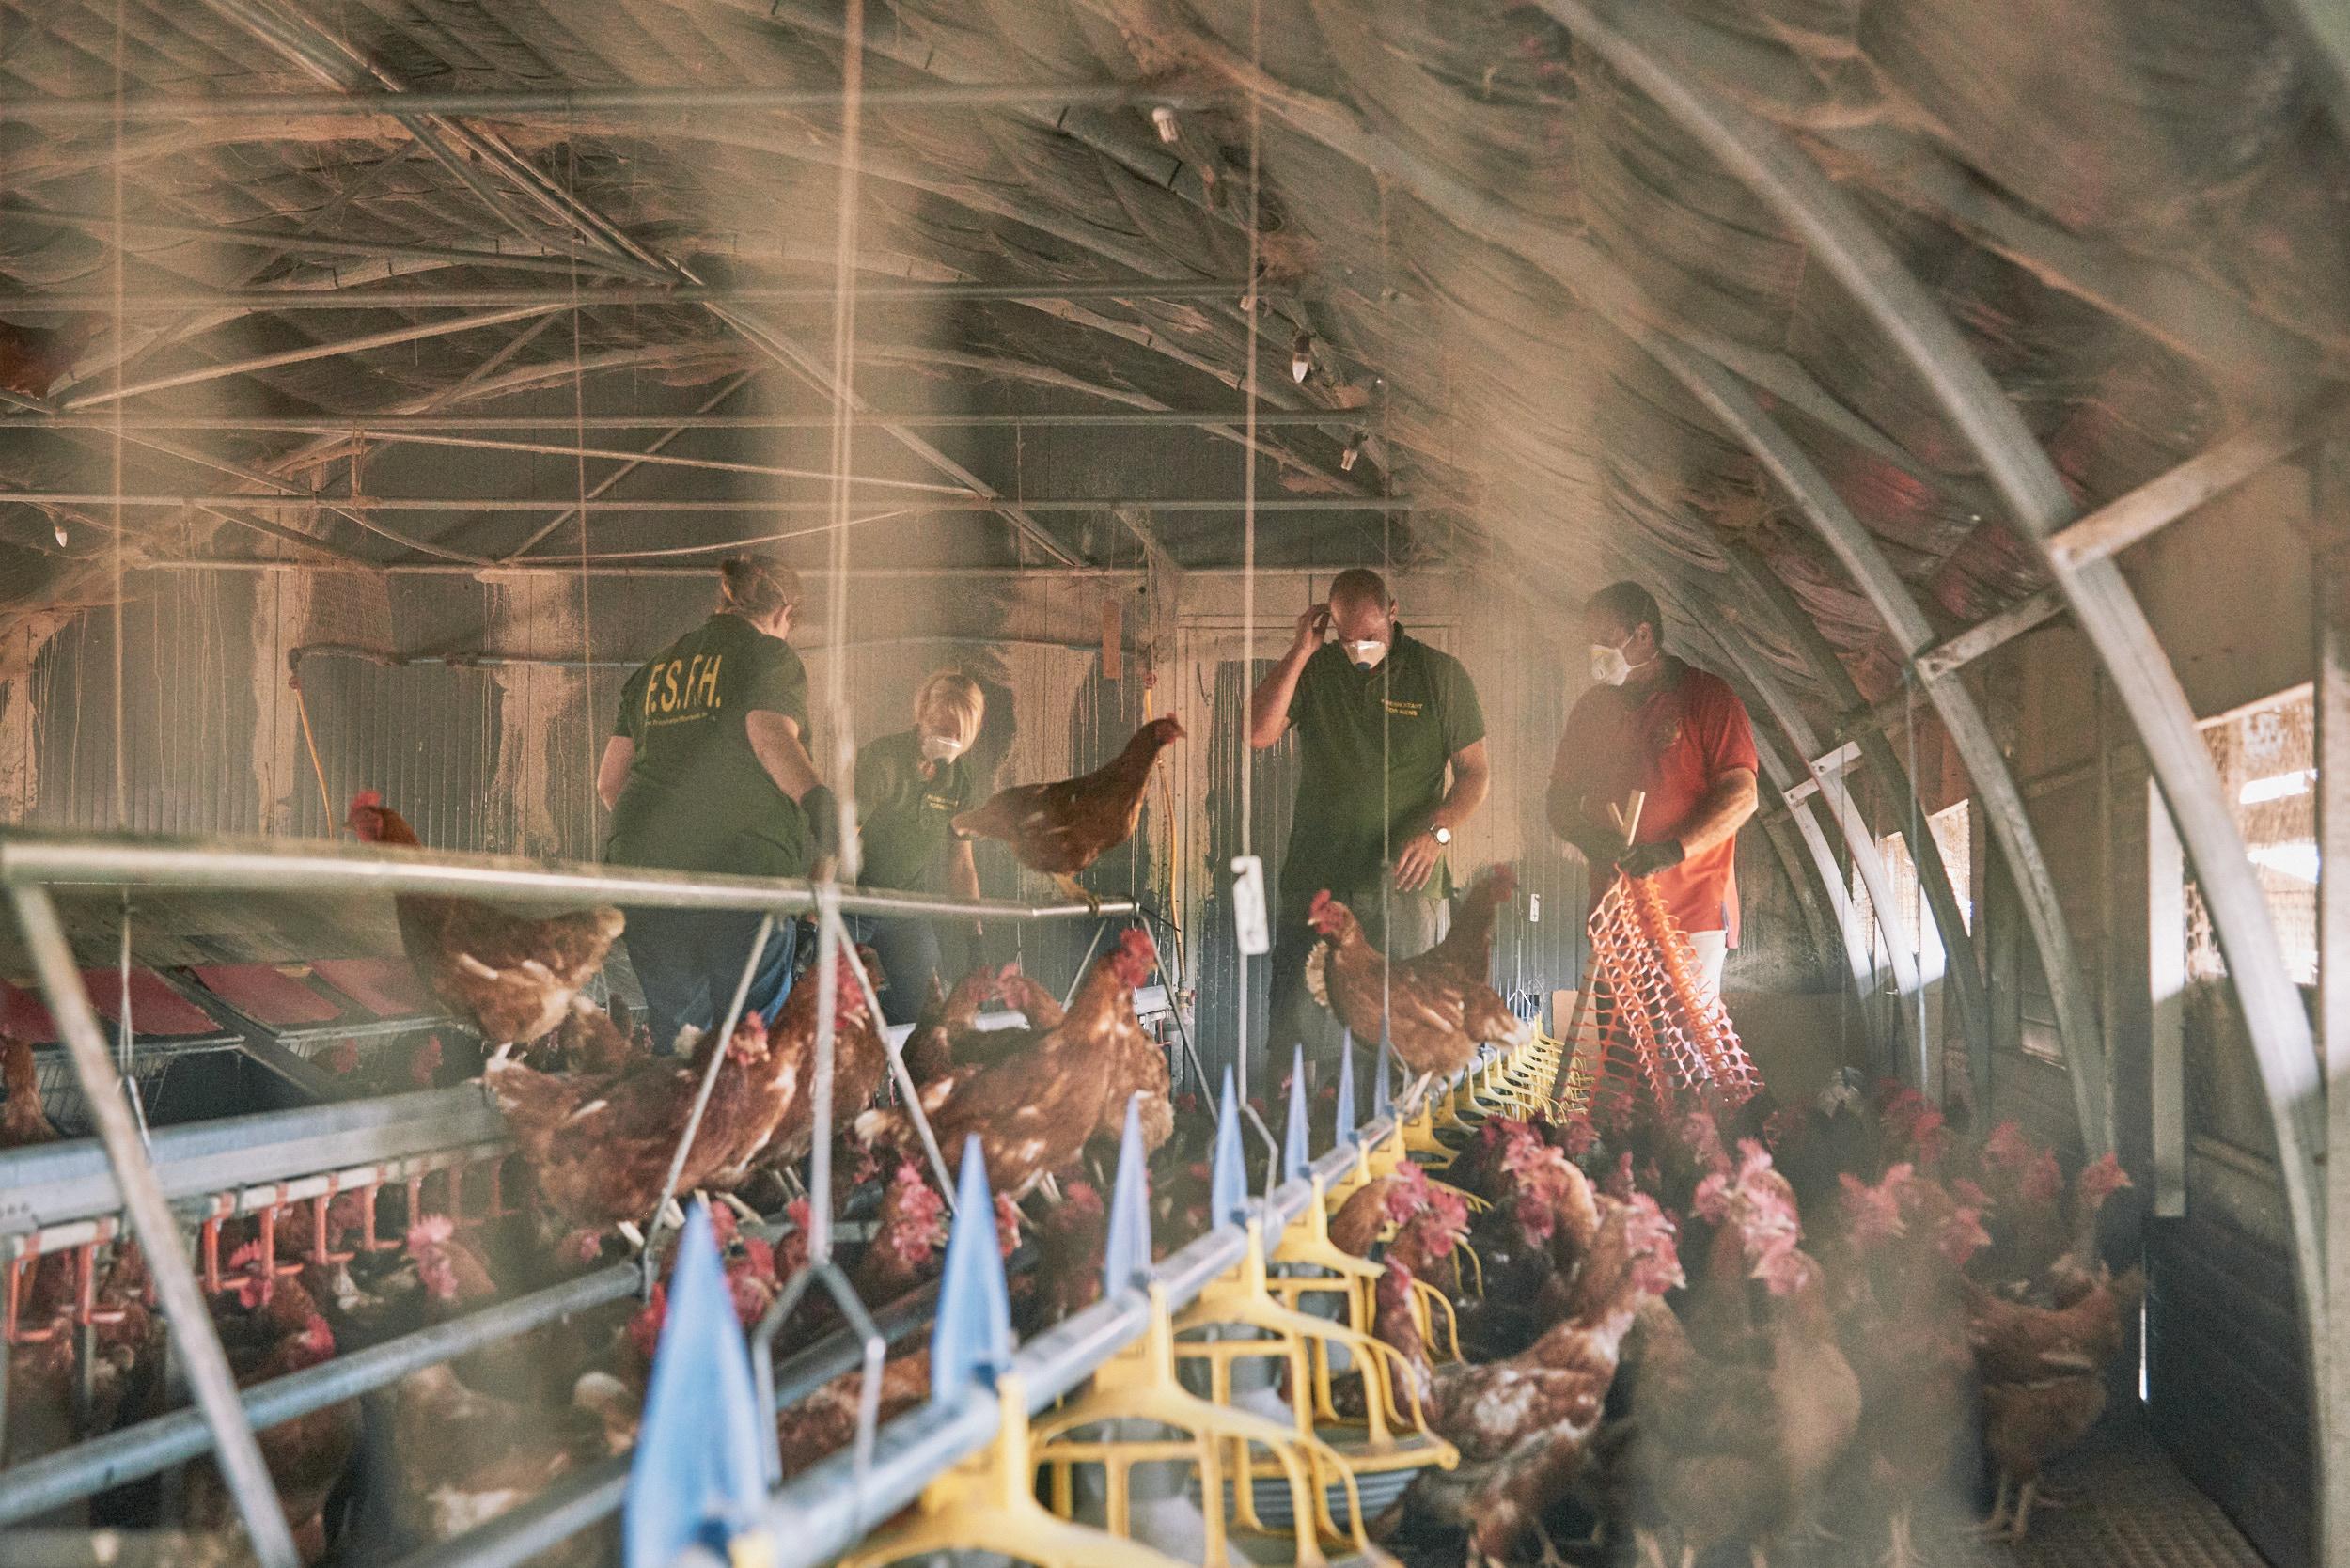 rookery-farm-organic-eggs-FSFH-rehoming15.jpg